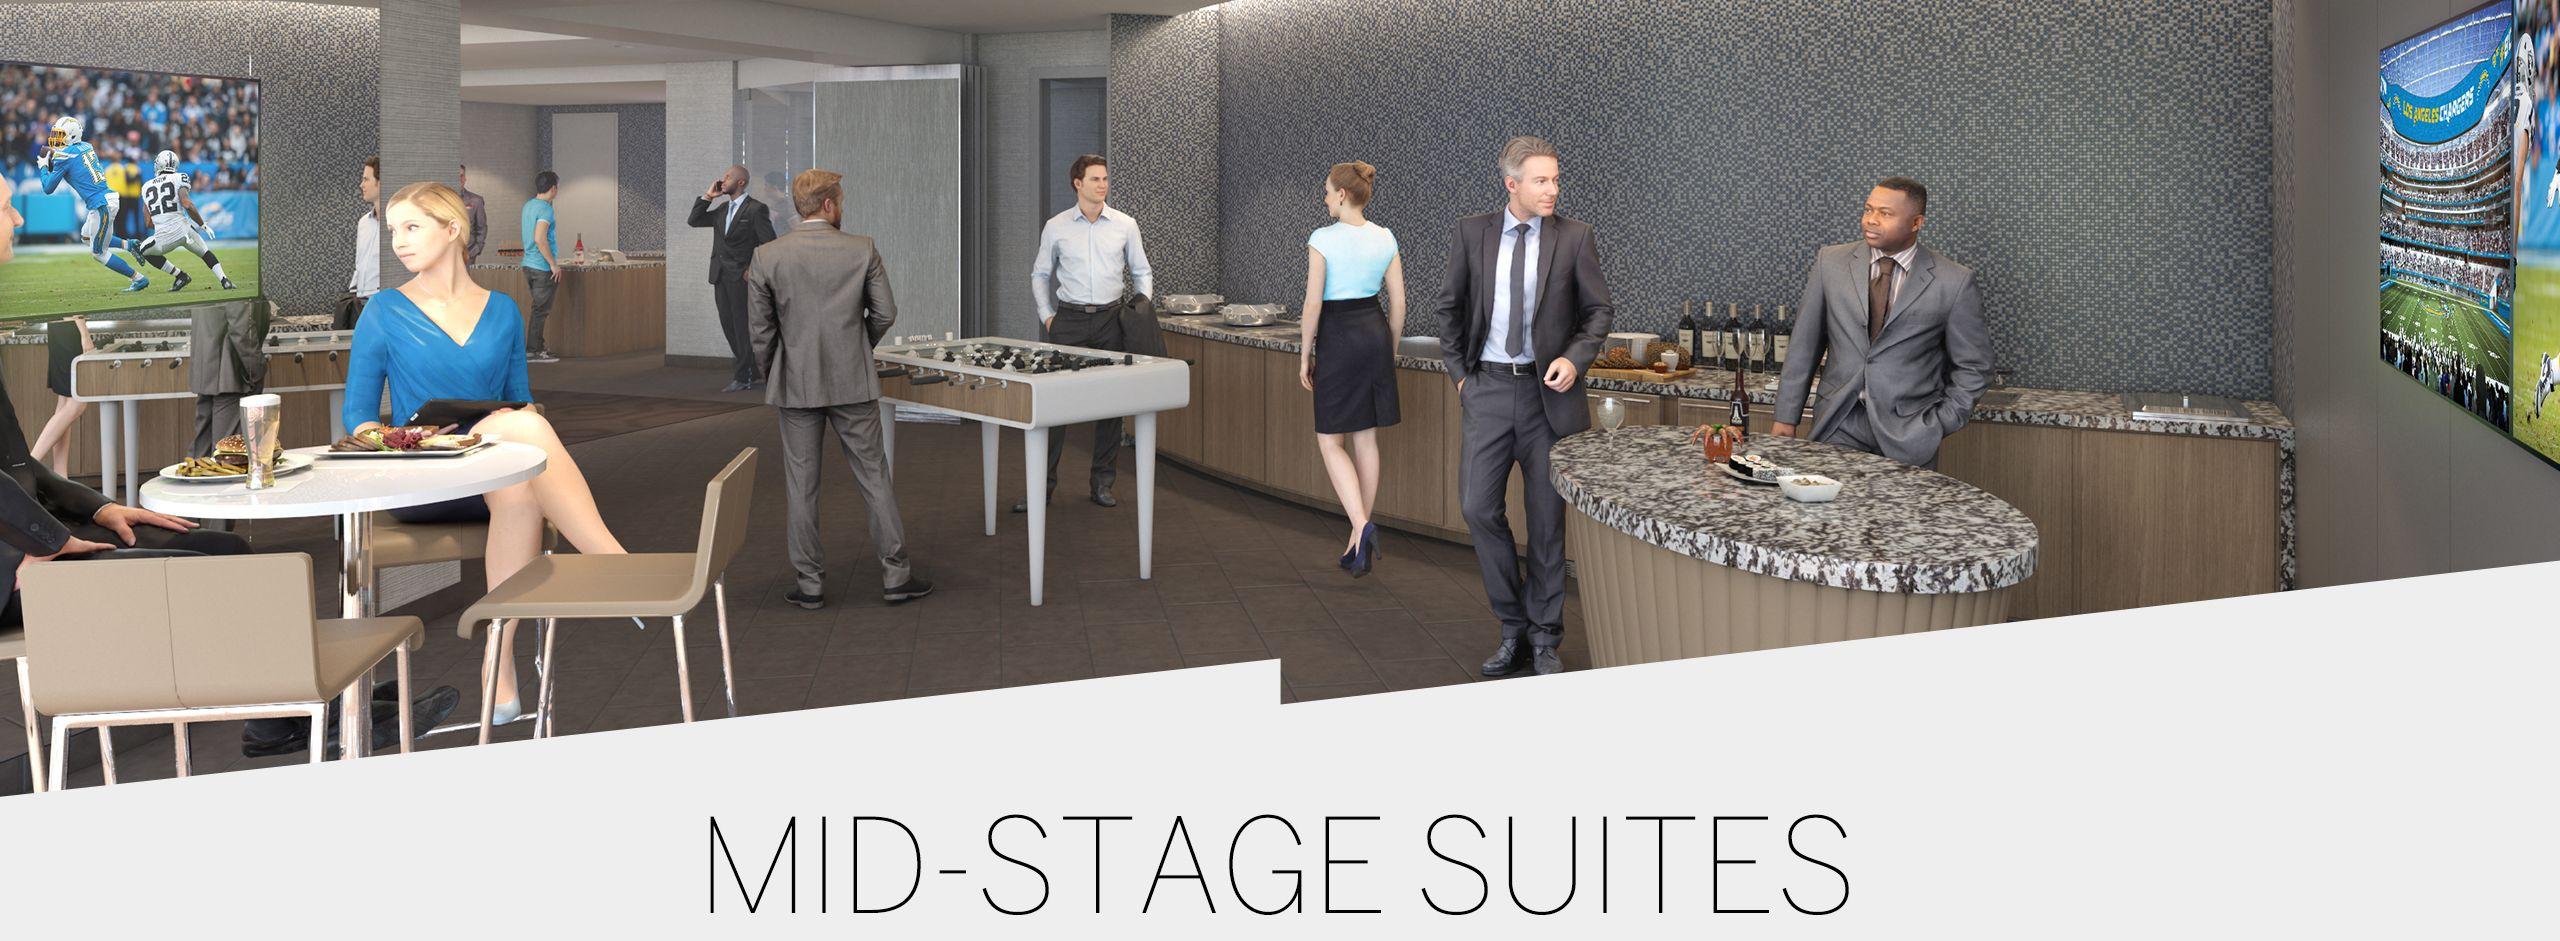 200625_Site_Suites_Header_Stage